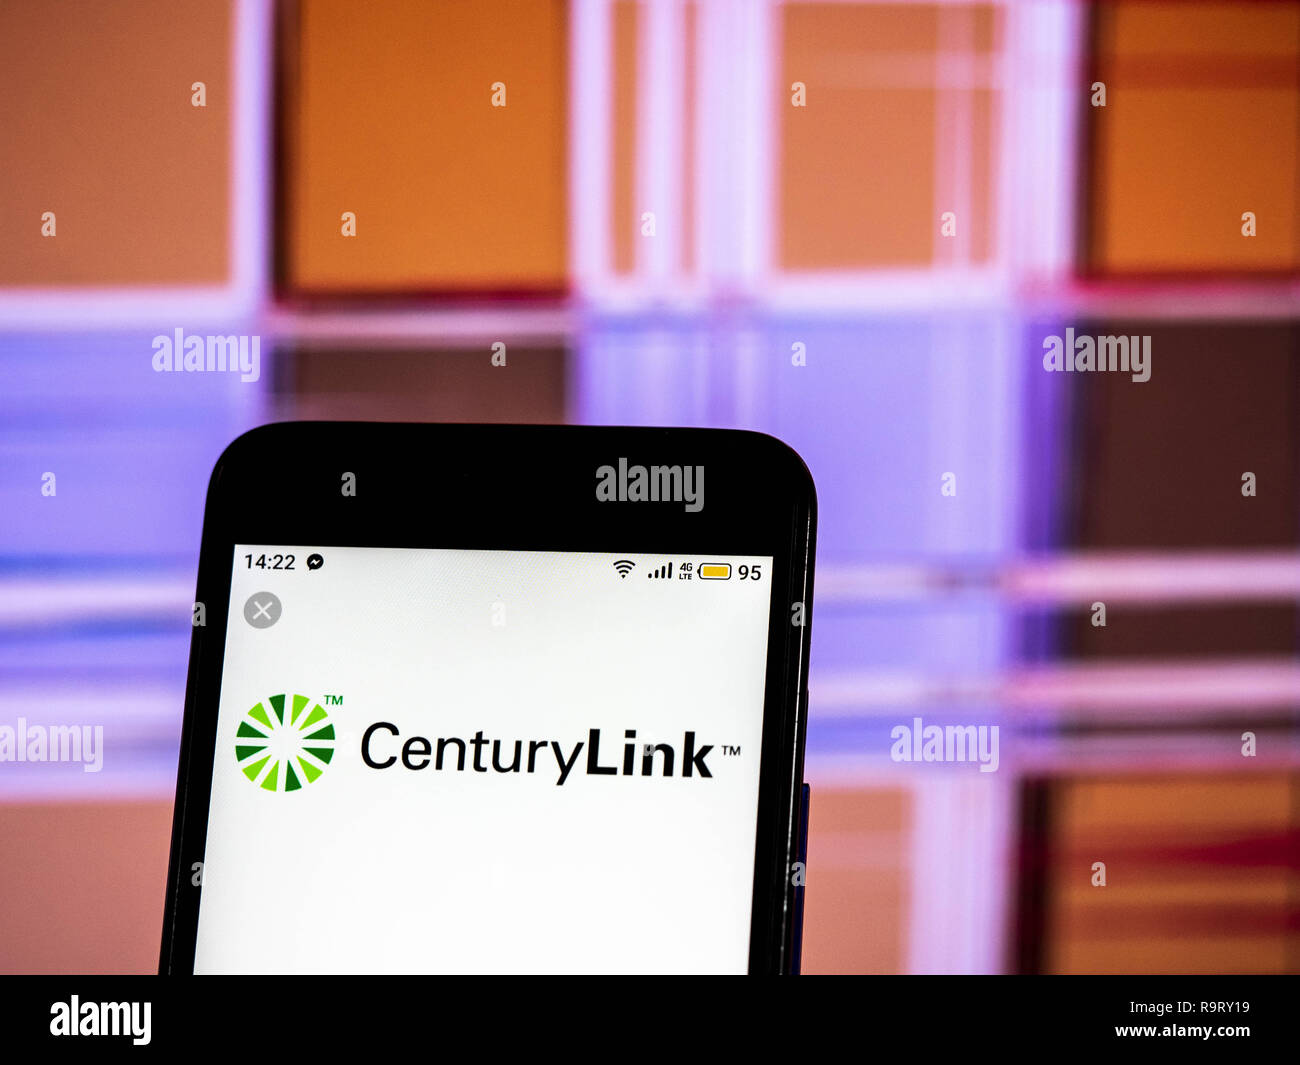 Centurylink Stock Photos & Centurylink Stock Images - Alamy